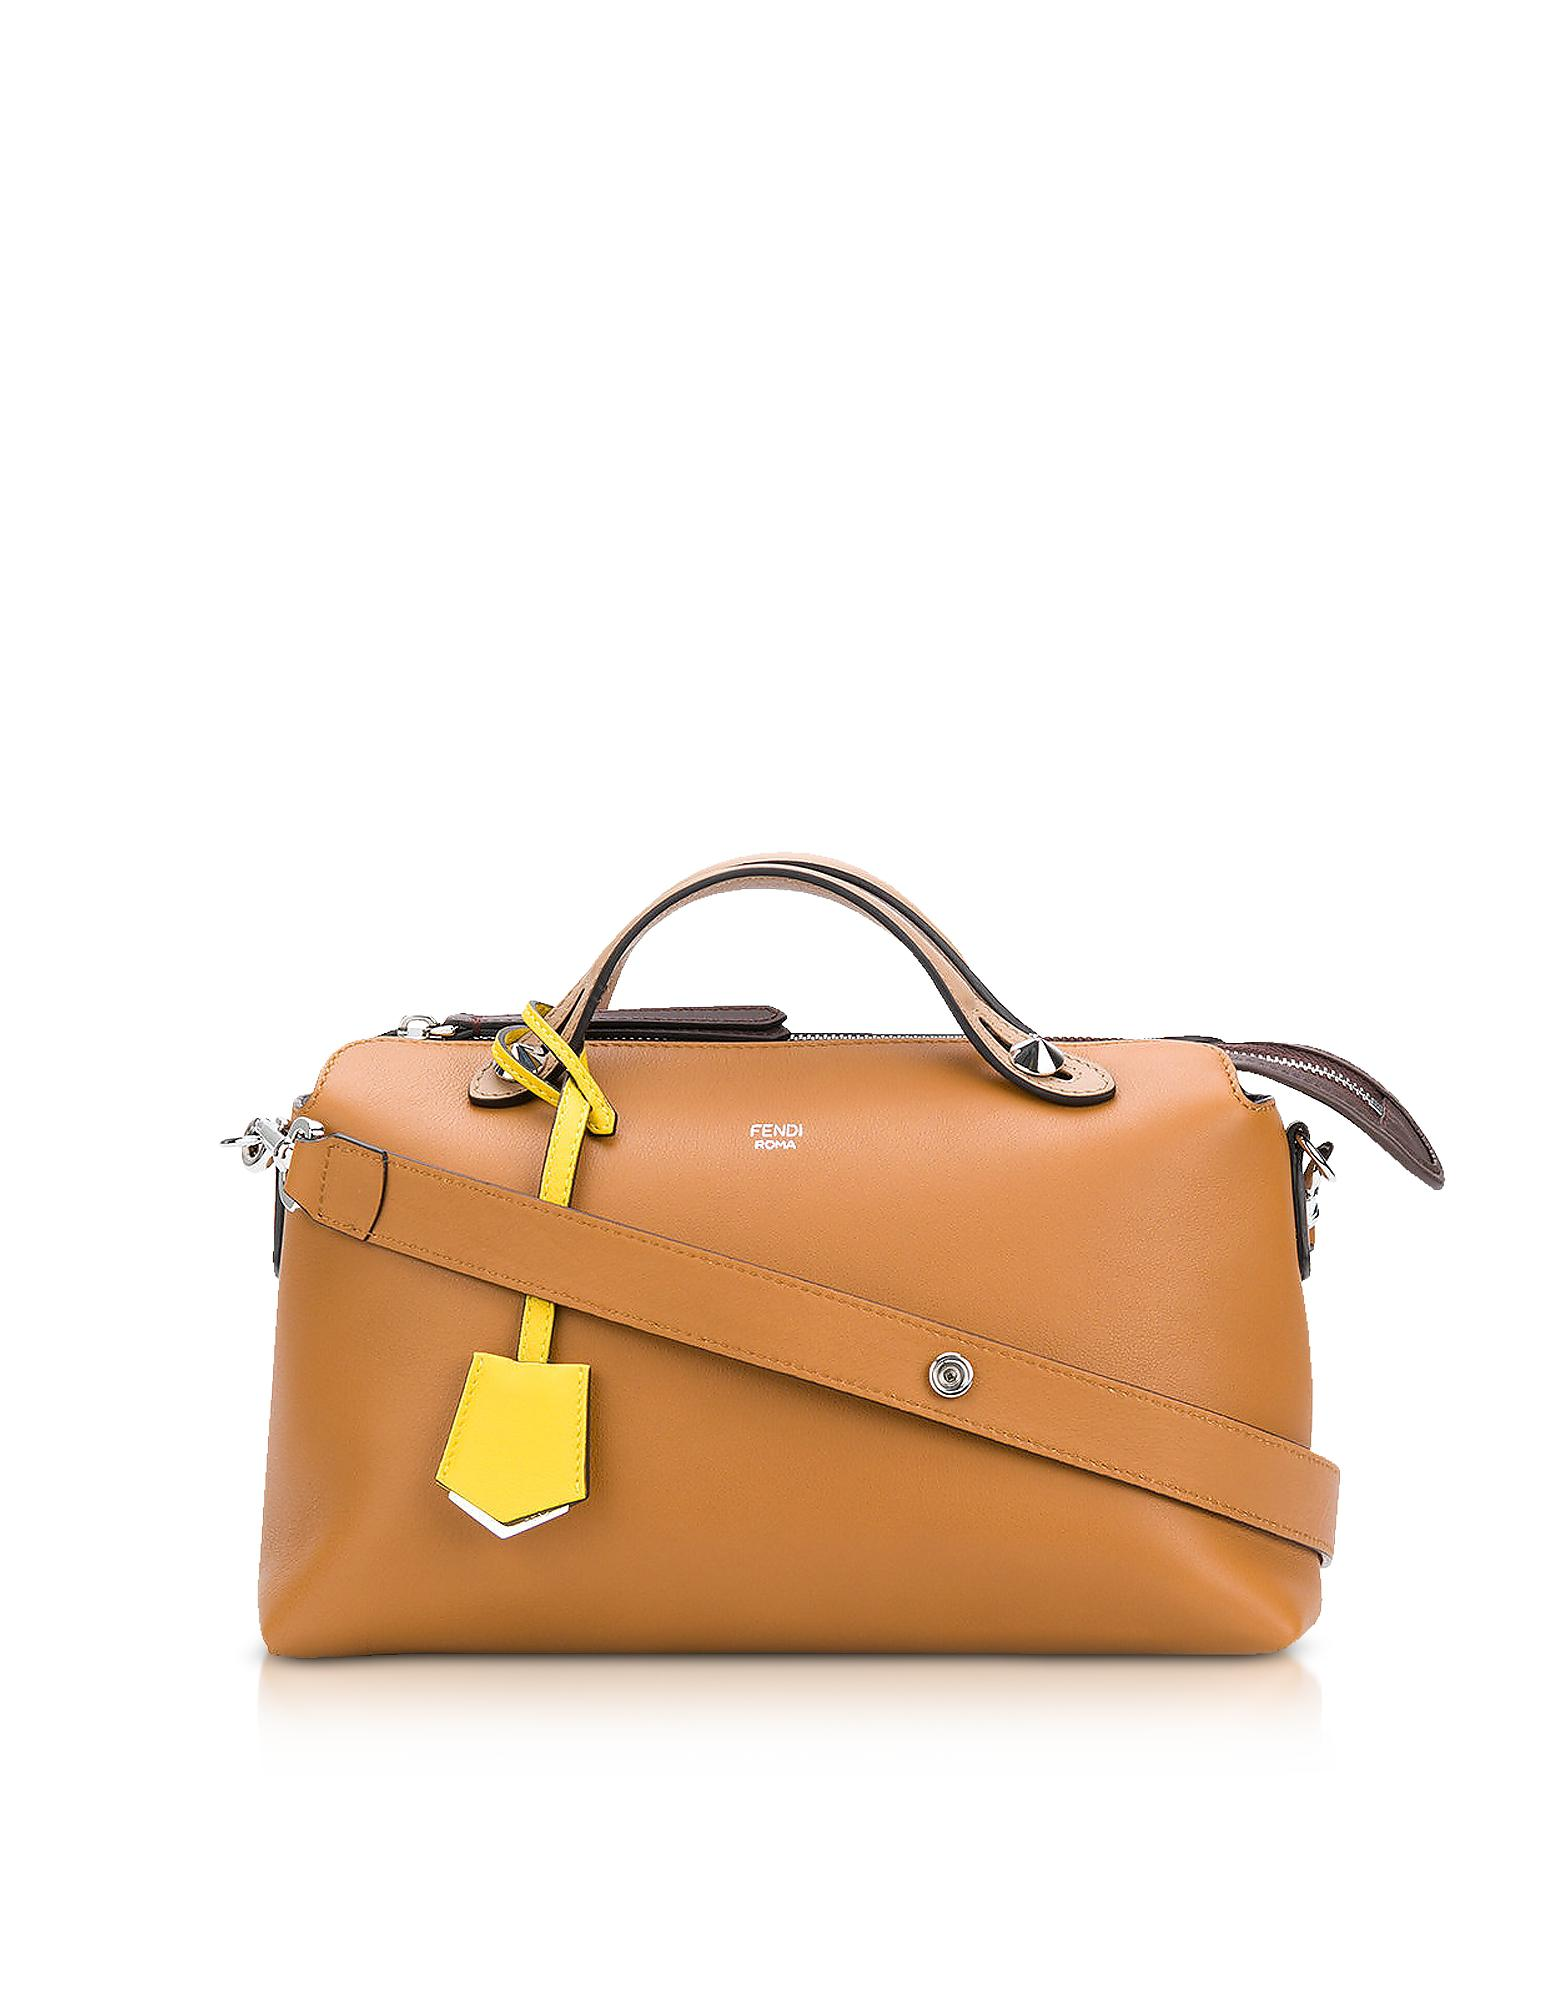 36ce0beb10e4 Lyst - Fendi By The Way Caramel Leather Satchel Bag